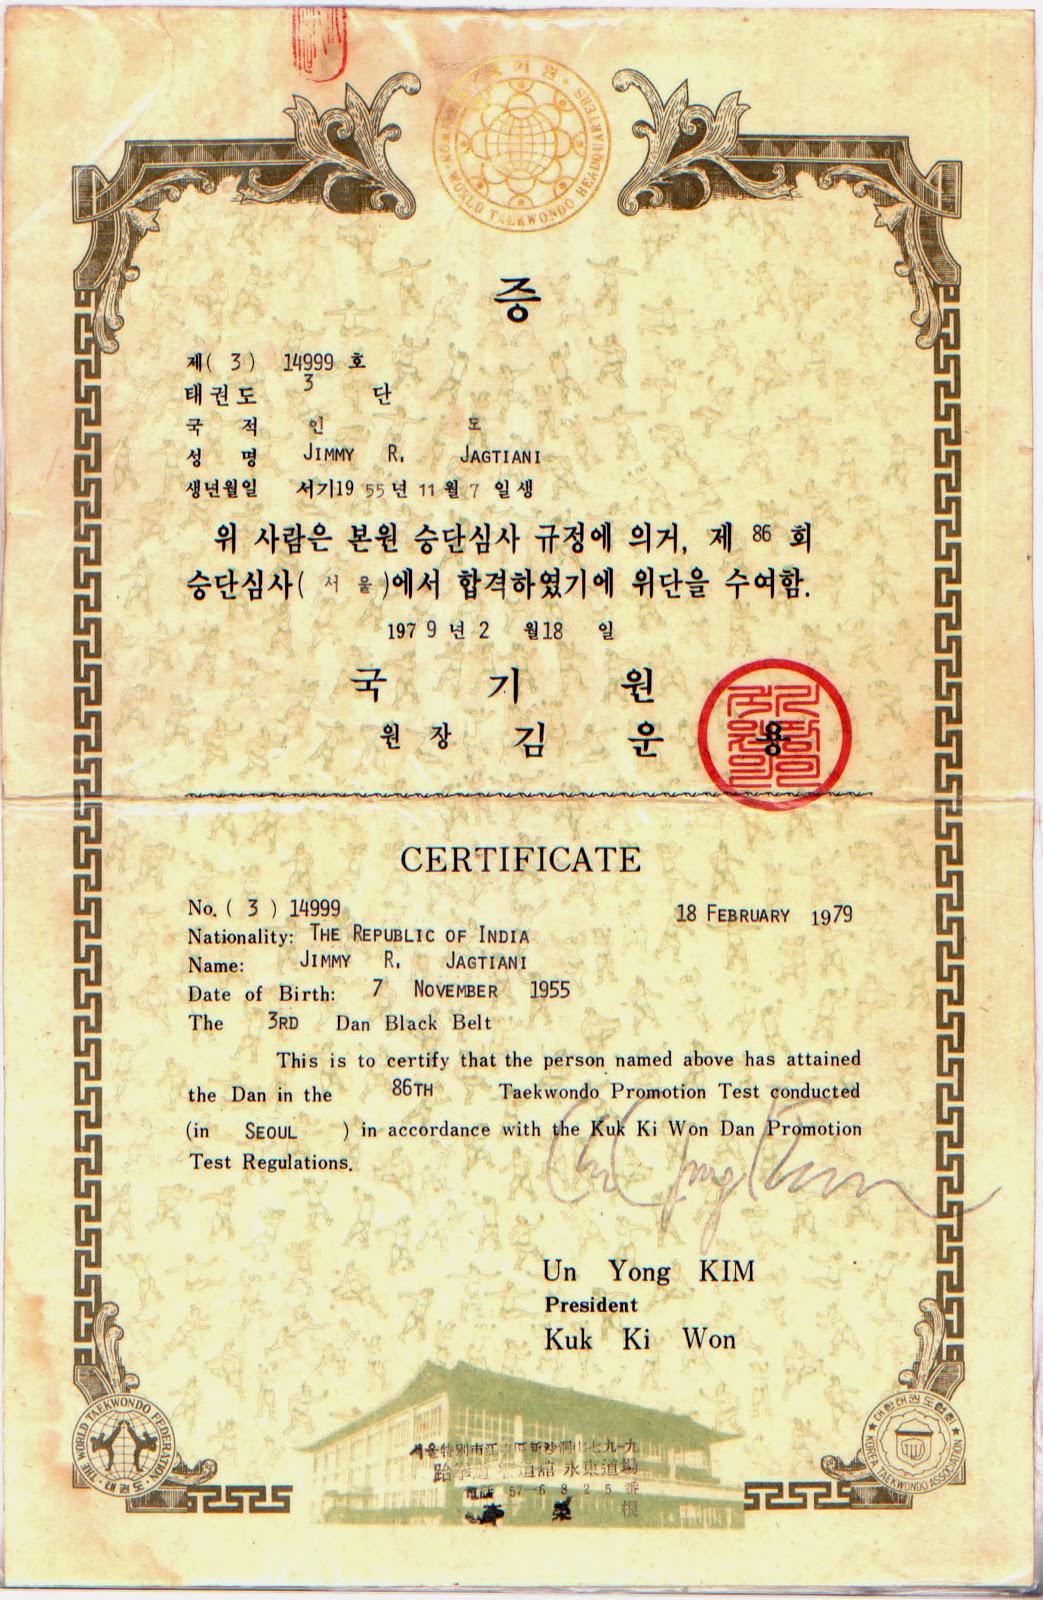 Howtaekwondocameintomylife gm jimmy r jagtiani qualified 3rd dan black belt certificate from kukkiwon dated 18th feb 1979 alramifo Choice Image